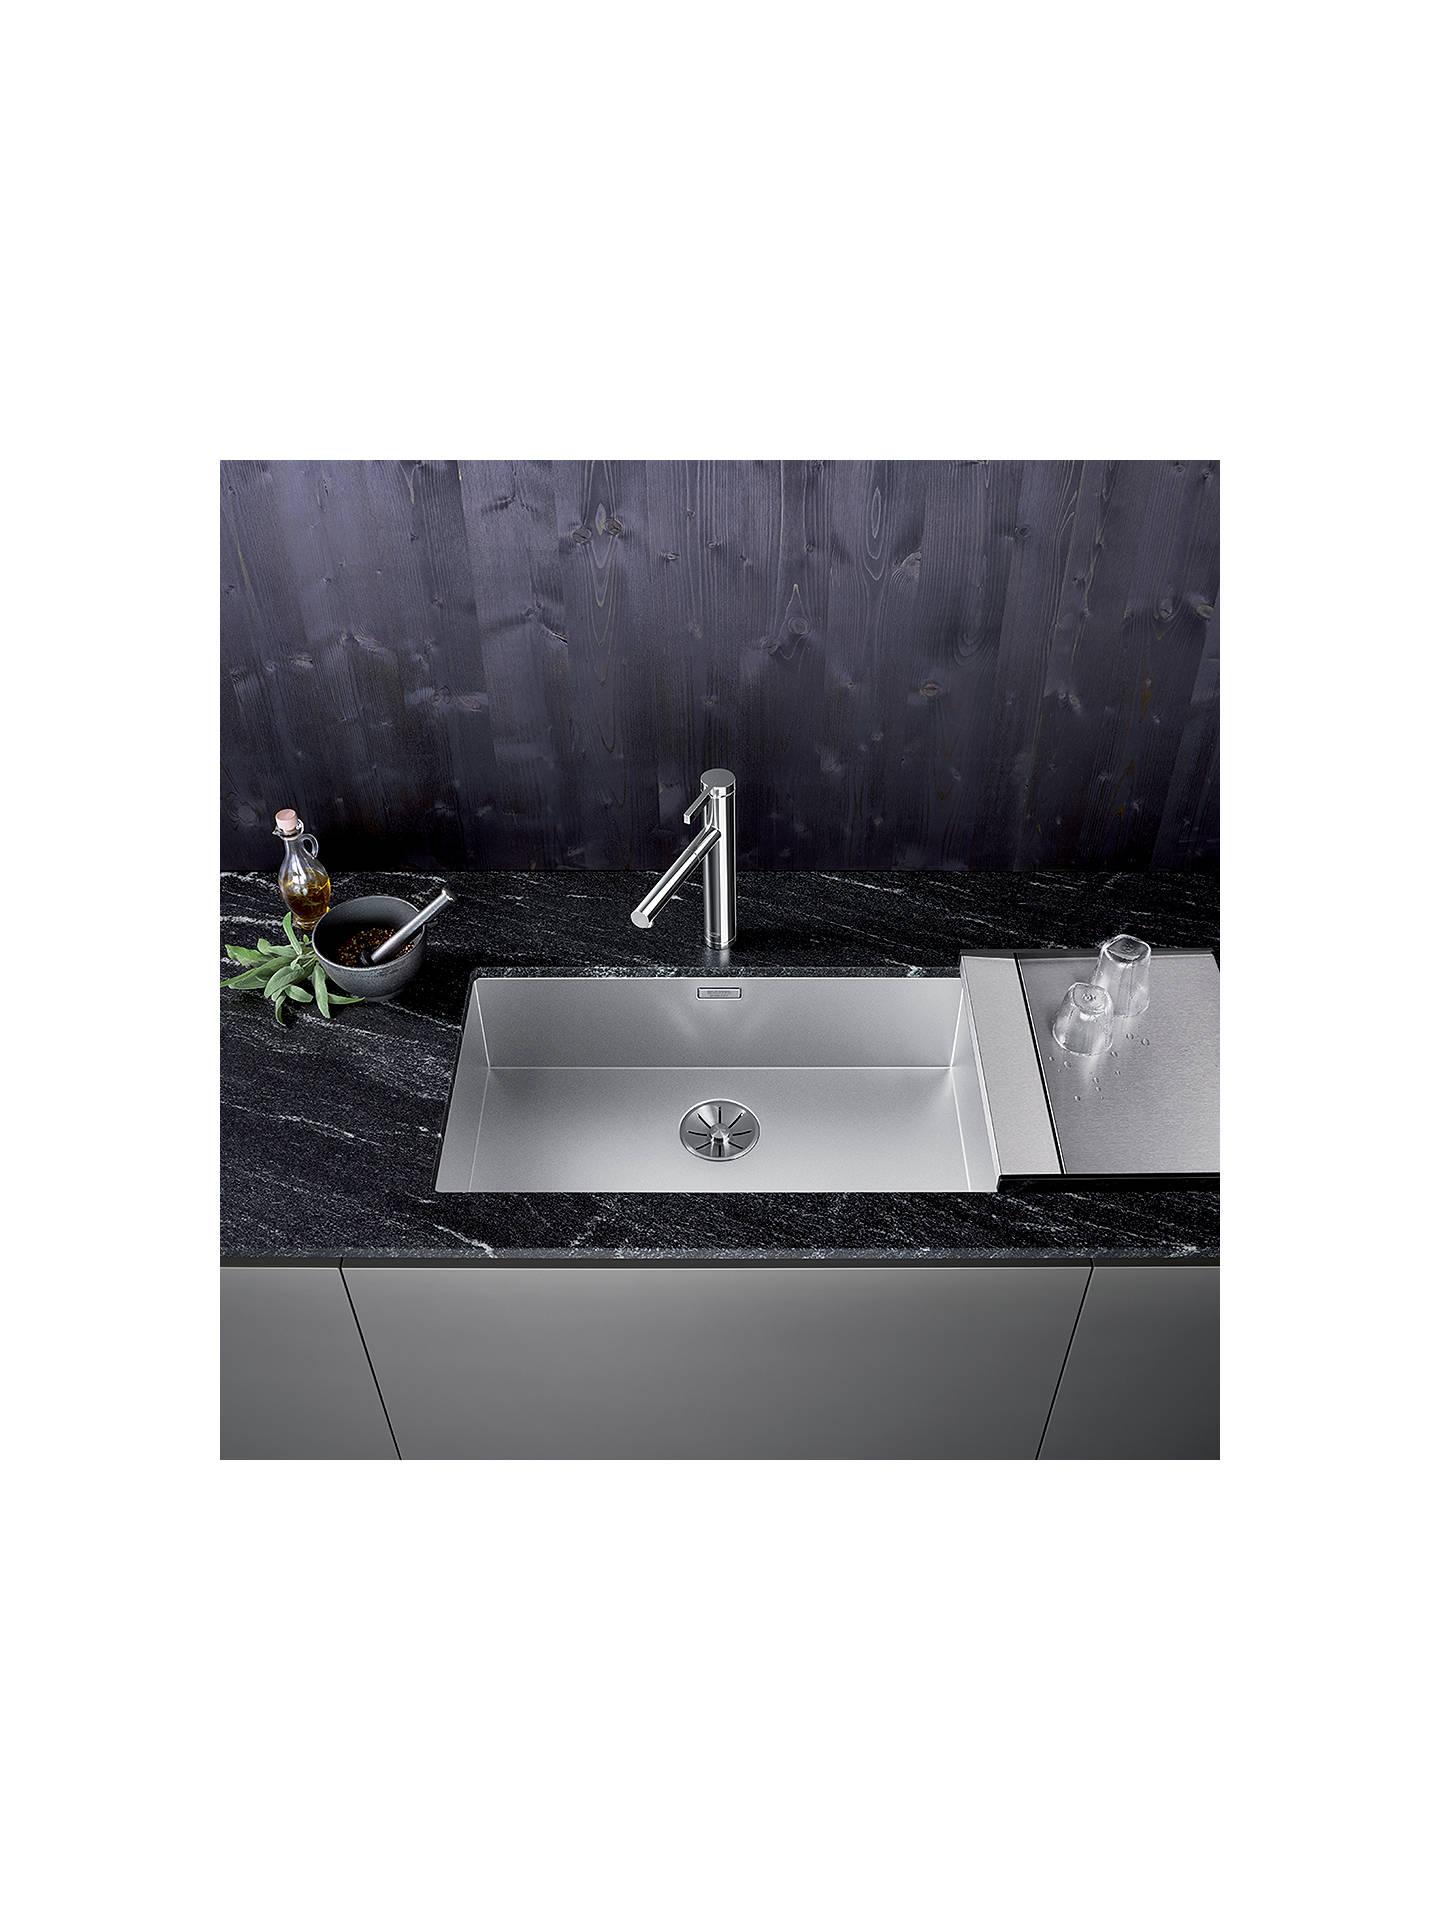 Stainless Steel Sink Drainer Basket.Stainless Steel Kitchen Sink Drainer Phandong Org